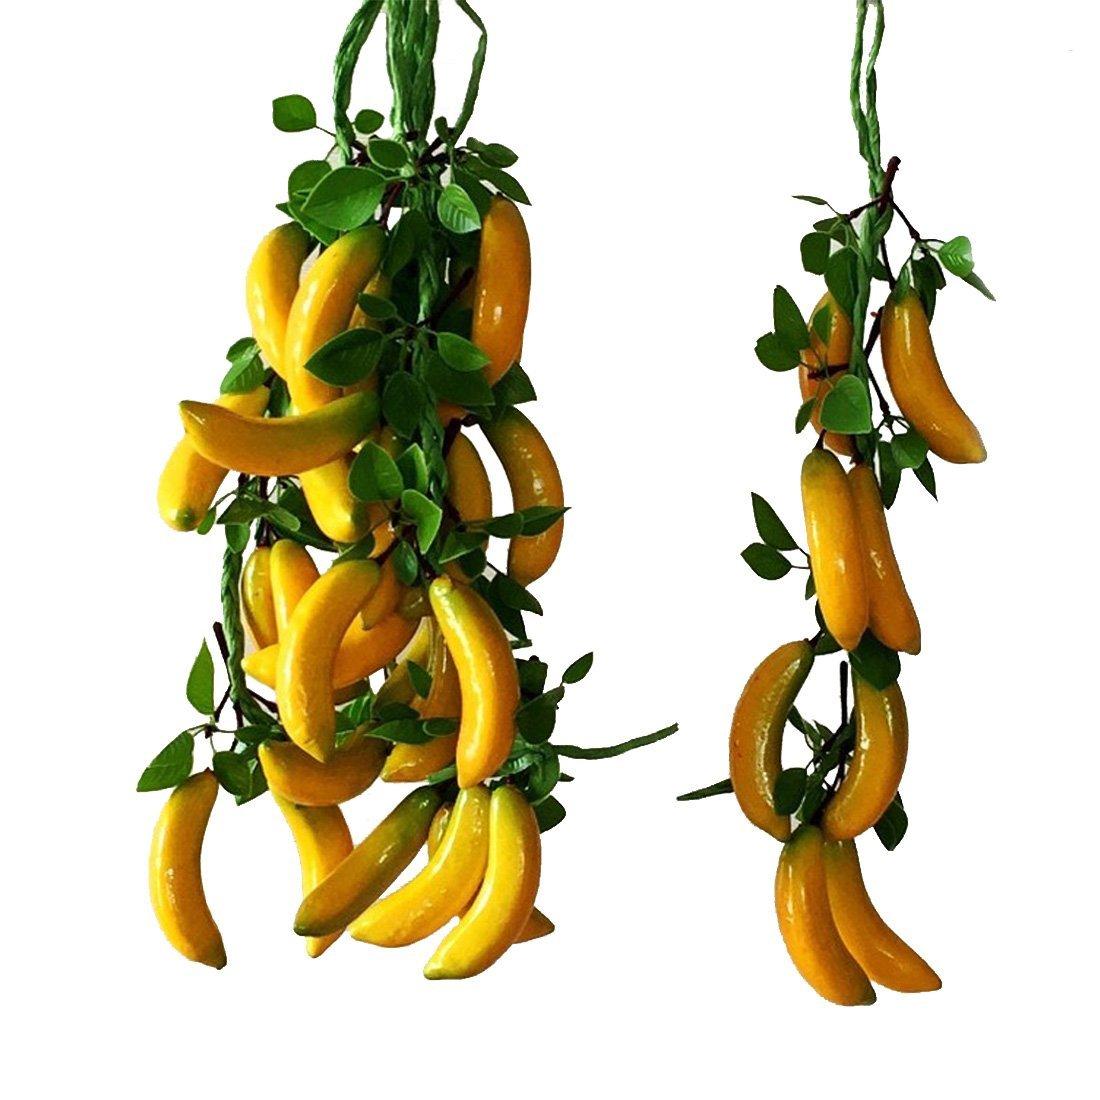 Calcifer 19.69''Artificial Fruits Vegetable String For Restaurant Hotel Home Garden Decoration Display (Banana String: 8 bulbs)